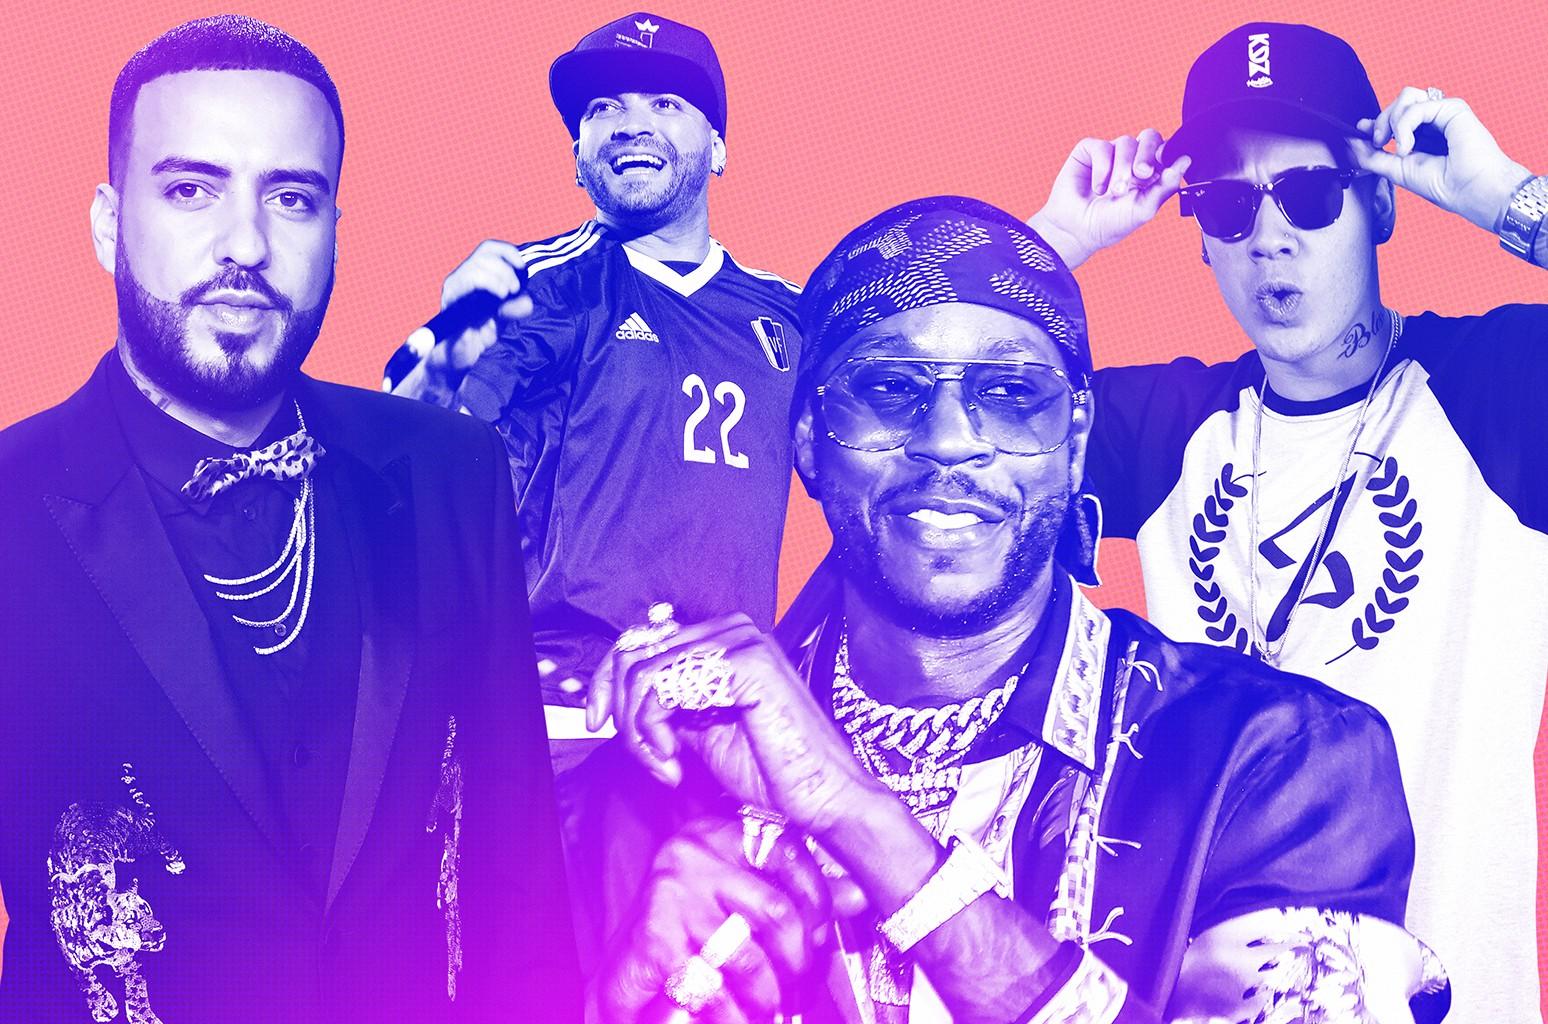 From left: French Montana, Nacho, 2 Chainz & MC kevinho